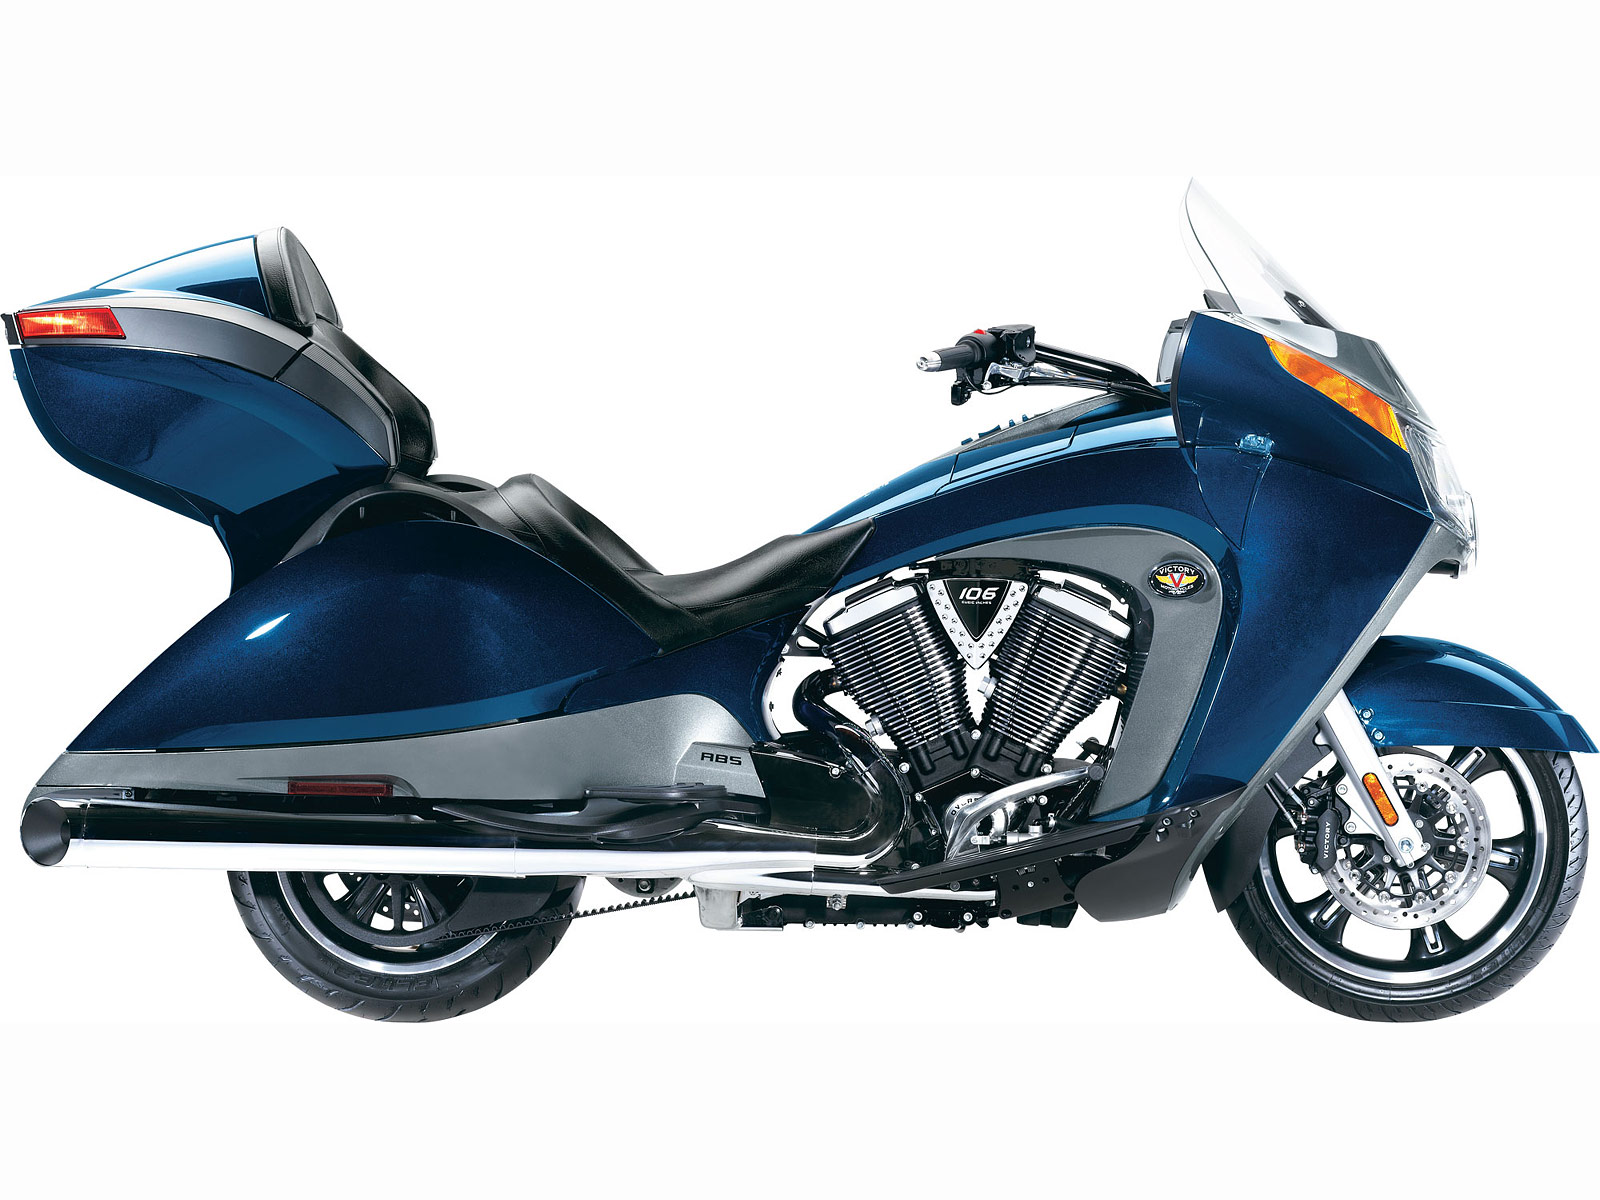 http://2.bp.blogspot.com/-YtbQjiC65OI/TwwBndGli0I/AAAAAAAAGY0/C-TXhTEpxwY/s1600/2012_Victory-Vision-Tour_motorcycle-desktop-wallpaper_3.jpg